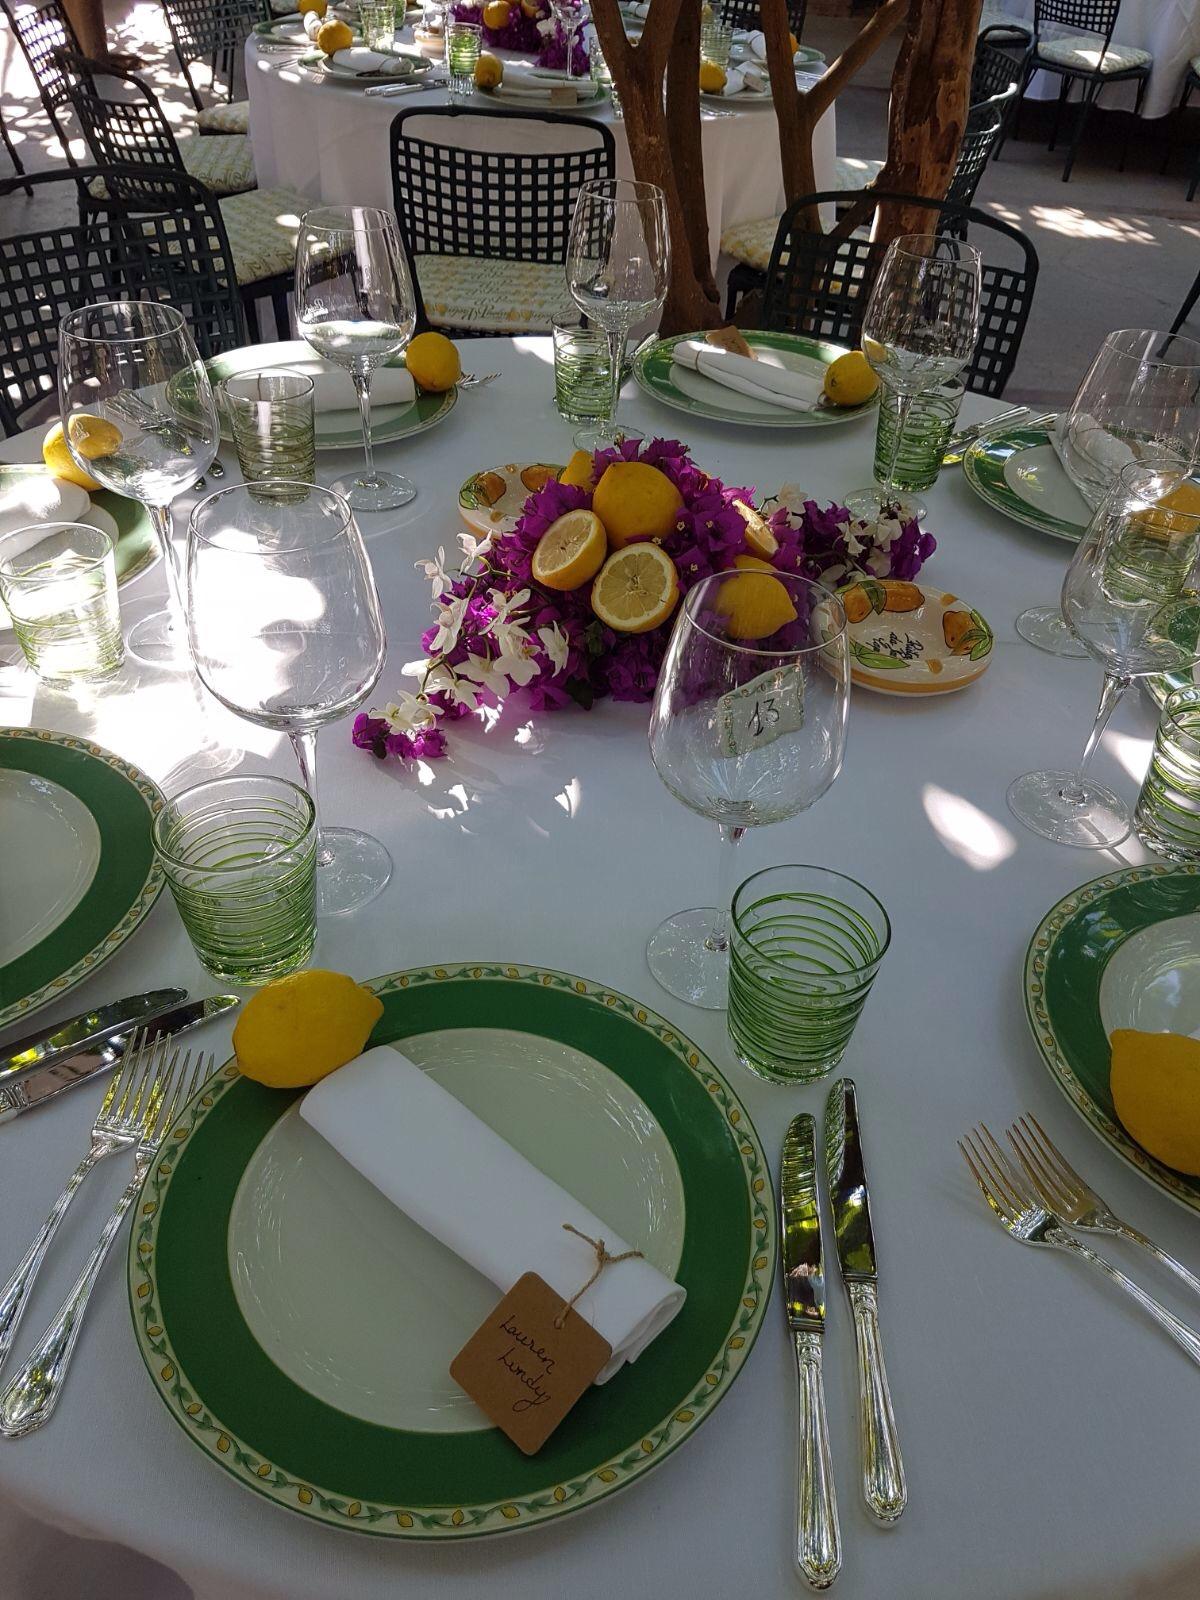 http://www.weddingamalfi.com/wp-content/uploads/Nathalie-and-Benjamin-wedding-day-in-Positano-4.jpg